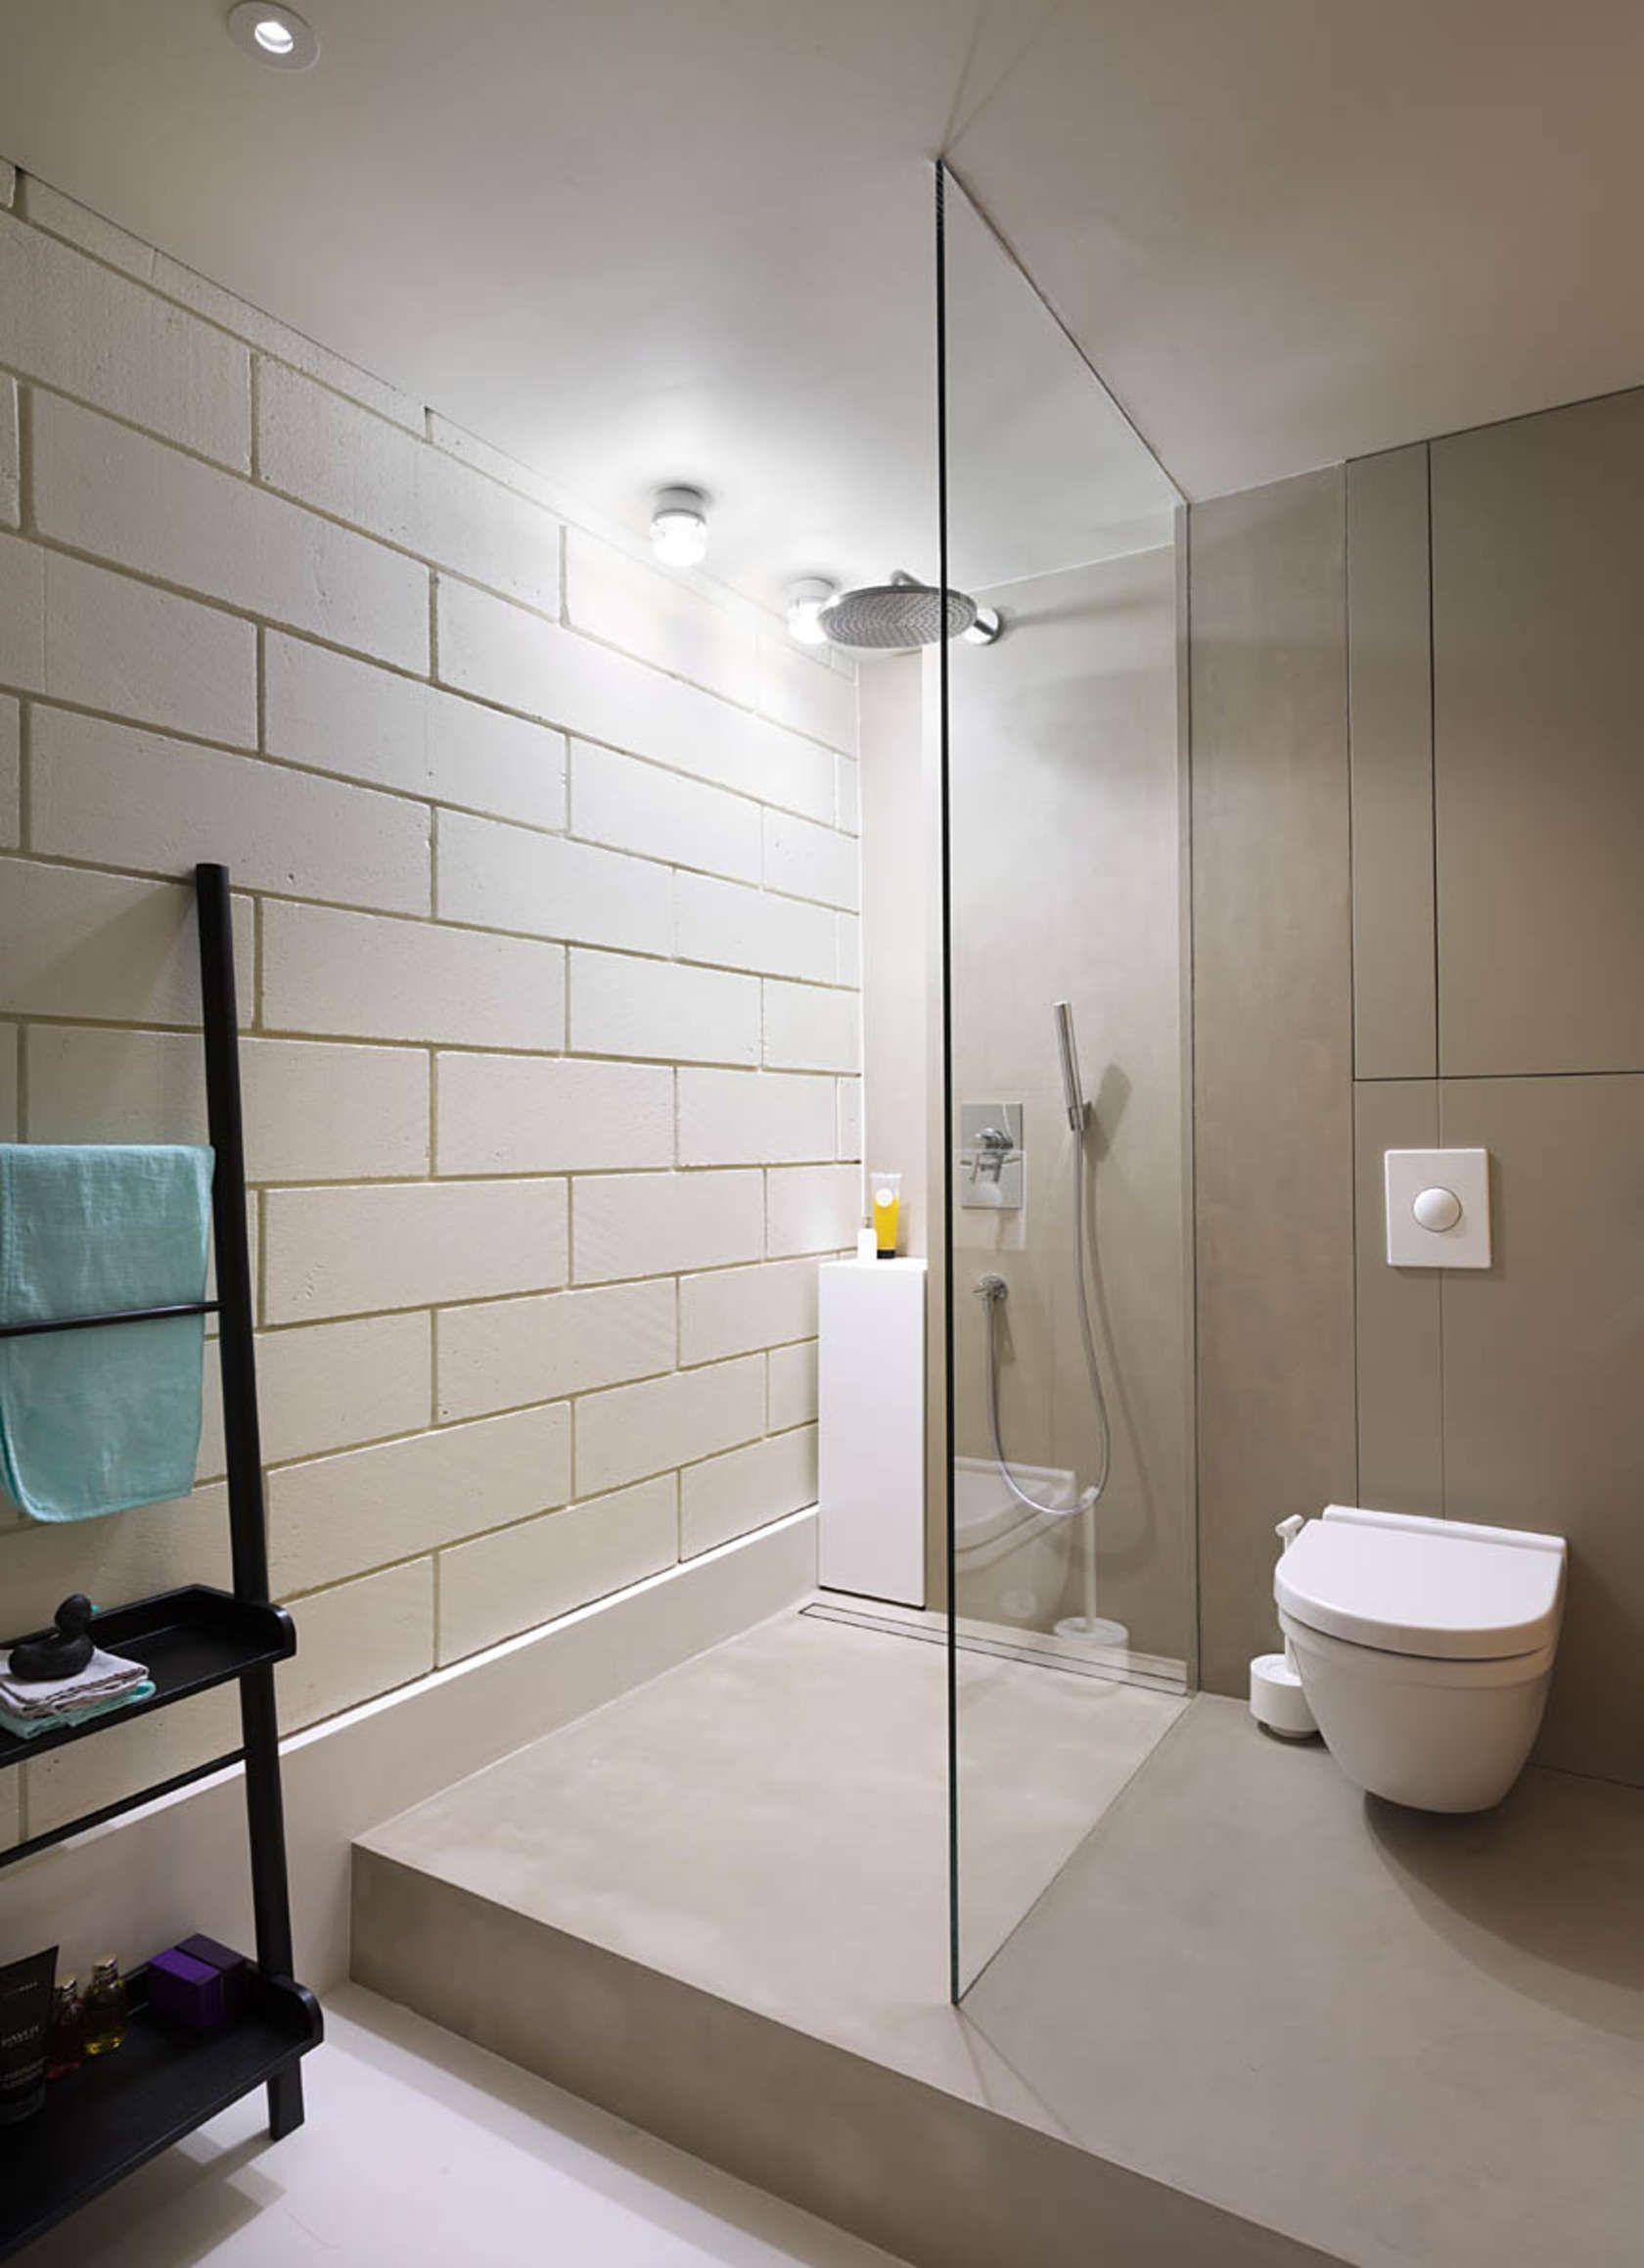 15 Awesome Asian Bathroom Design Ideas for 2018 | Pinterest | Asian ...